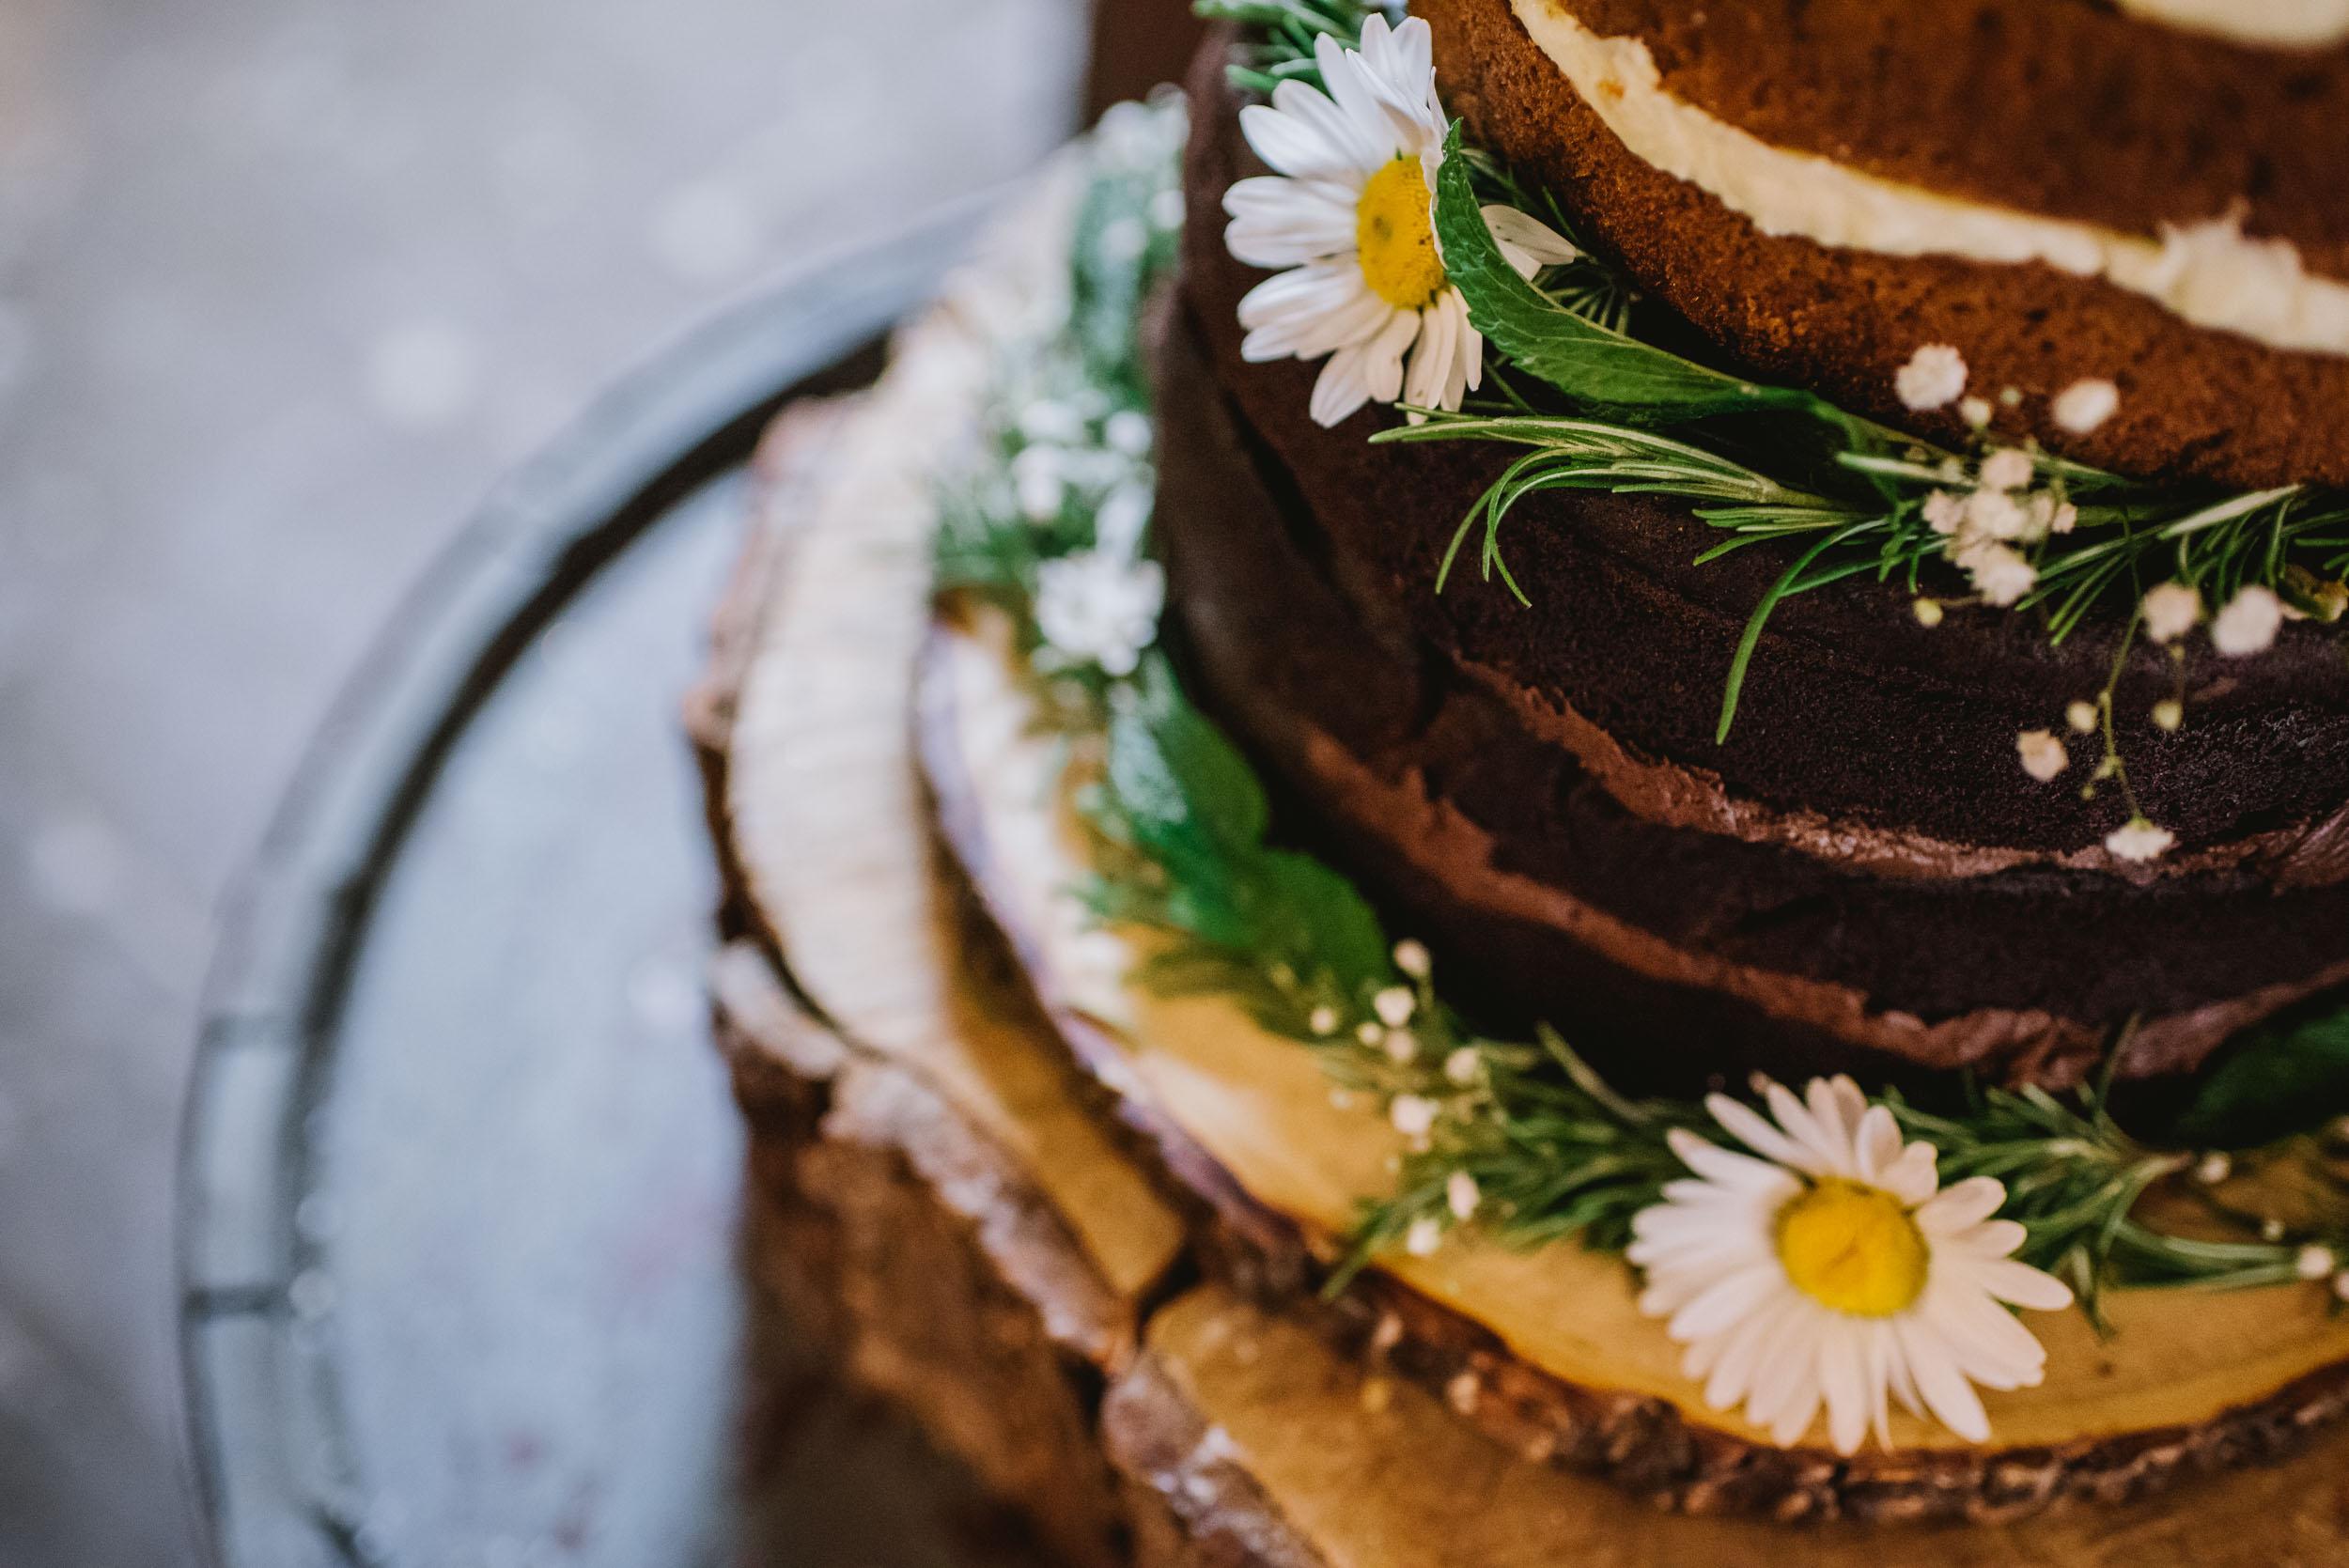 Donington-park-farm-wedding-photography-270.jpg